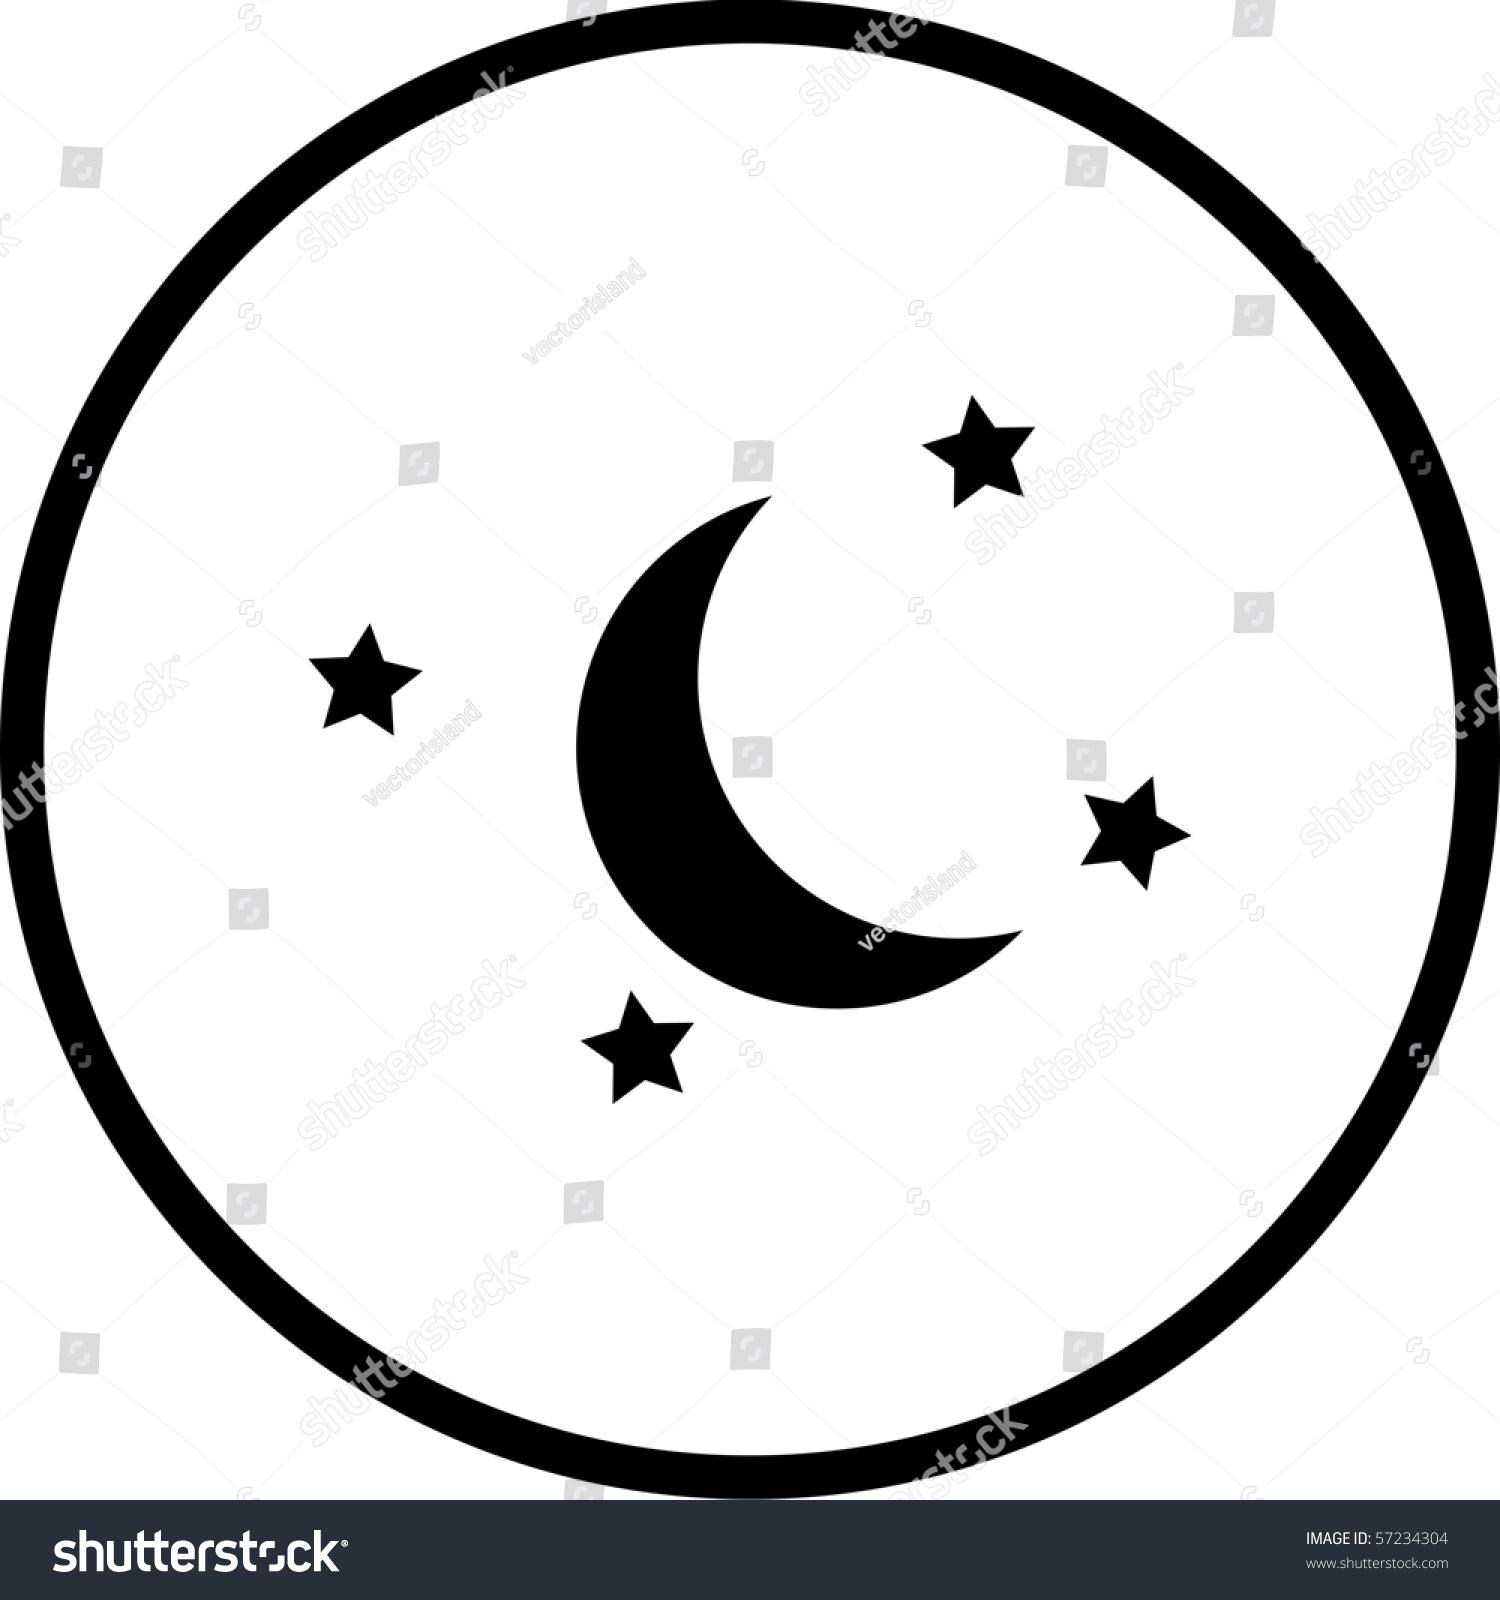 Moon Stars Symbol Stock Illustration 57234304 Shutterstock